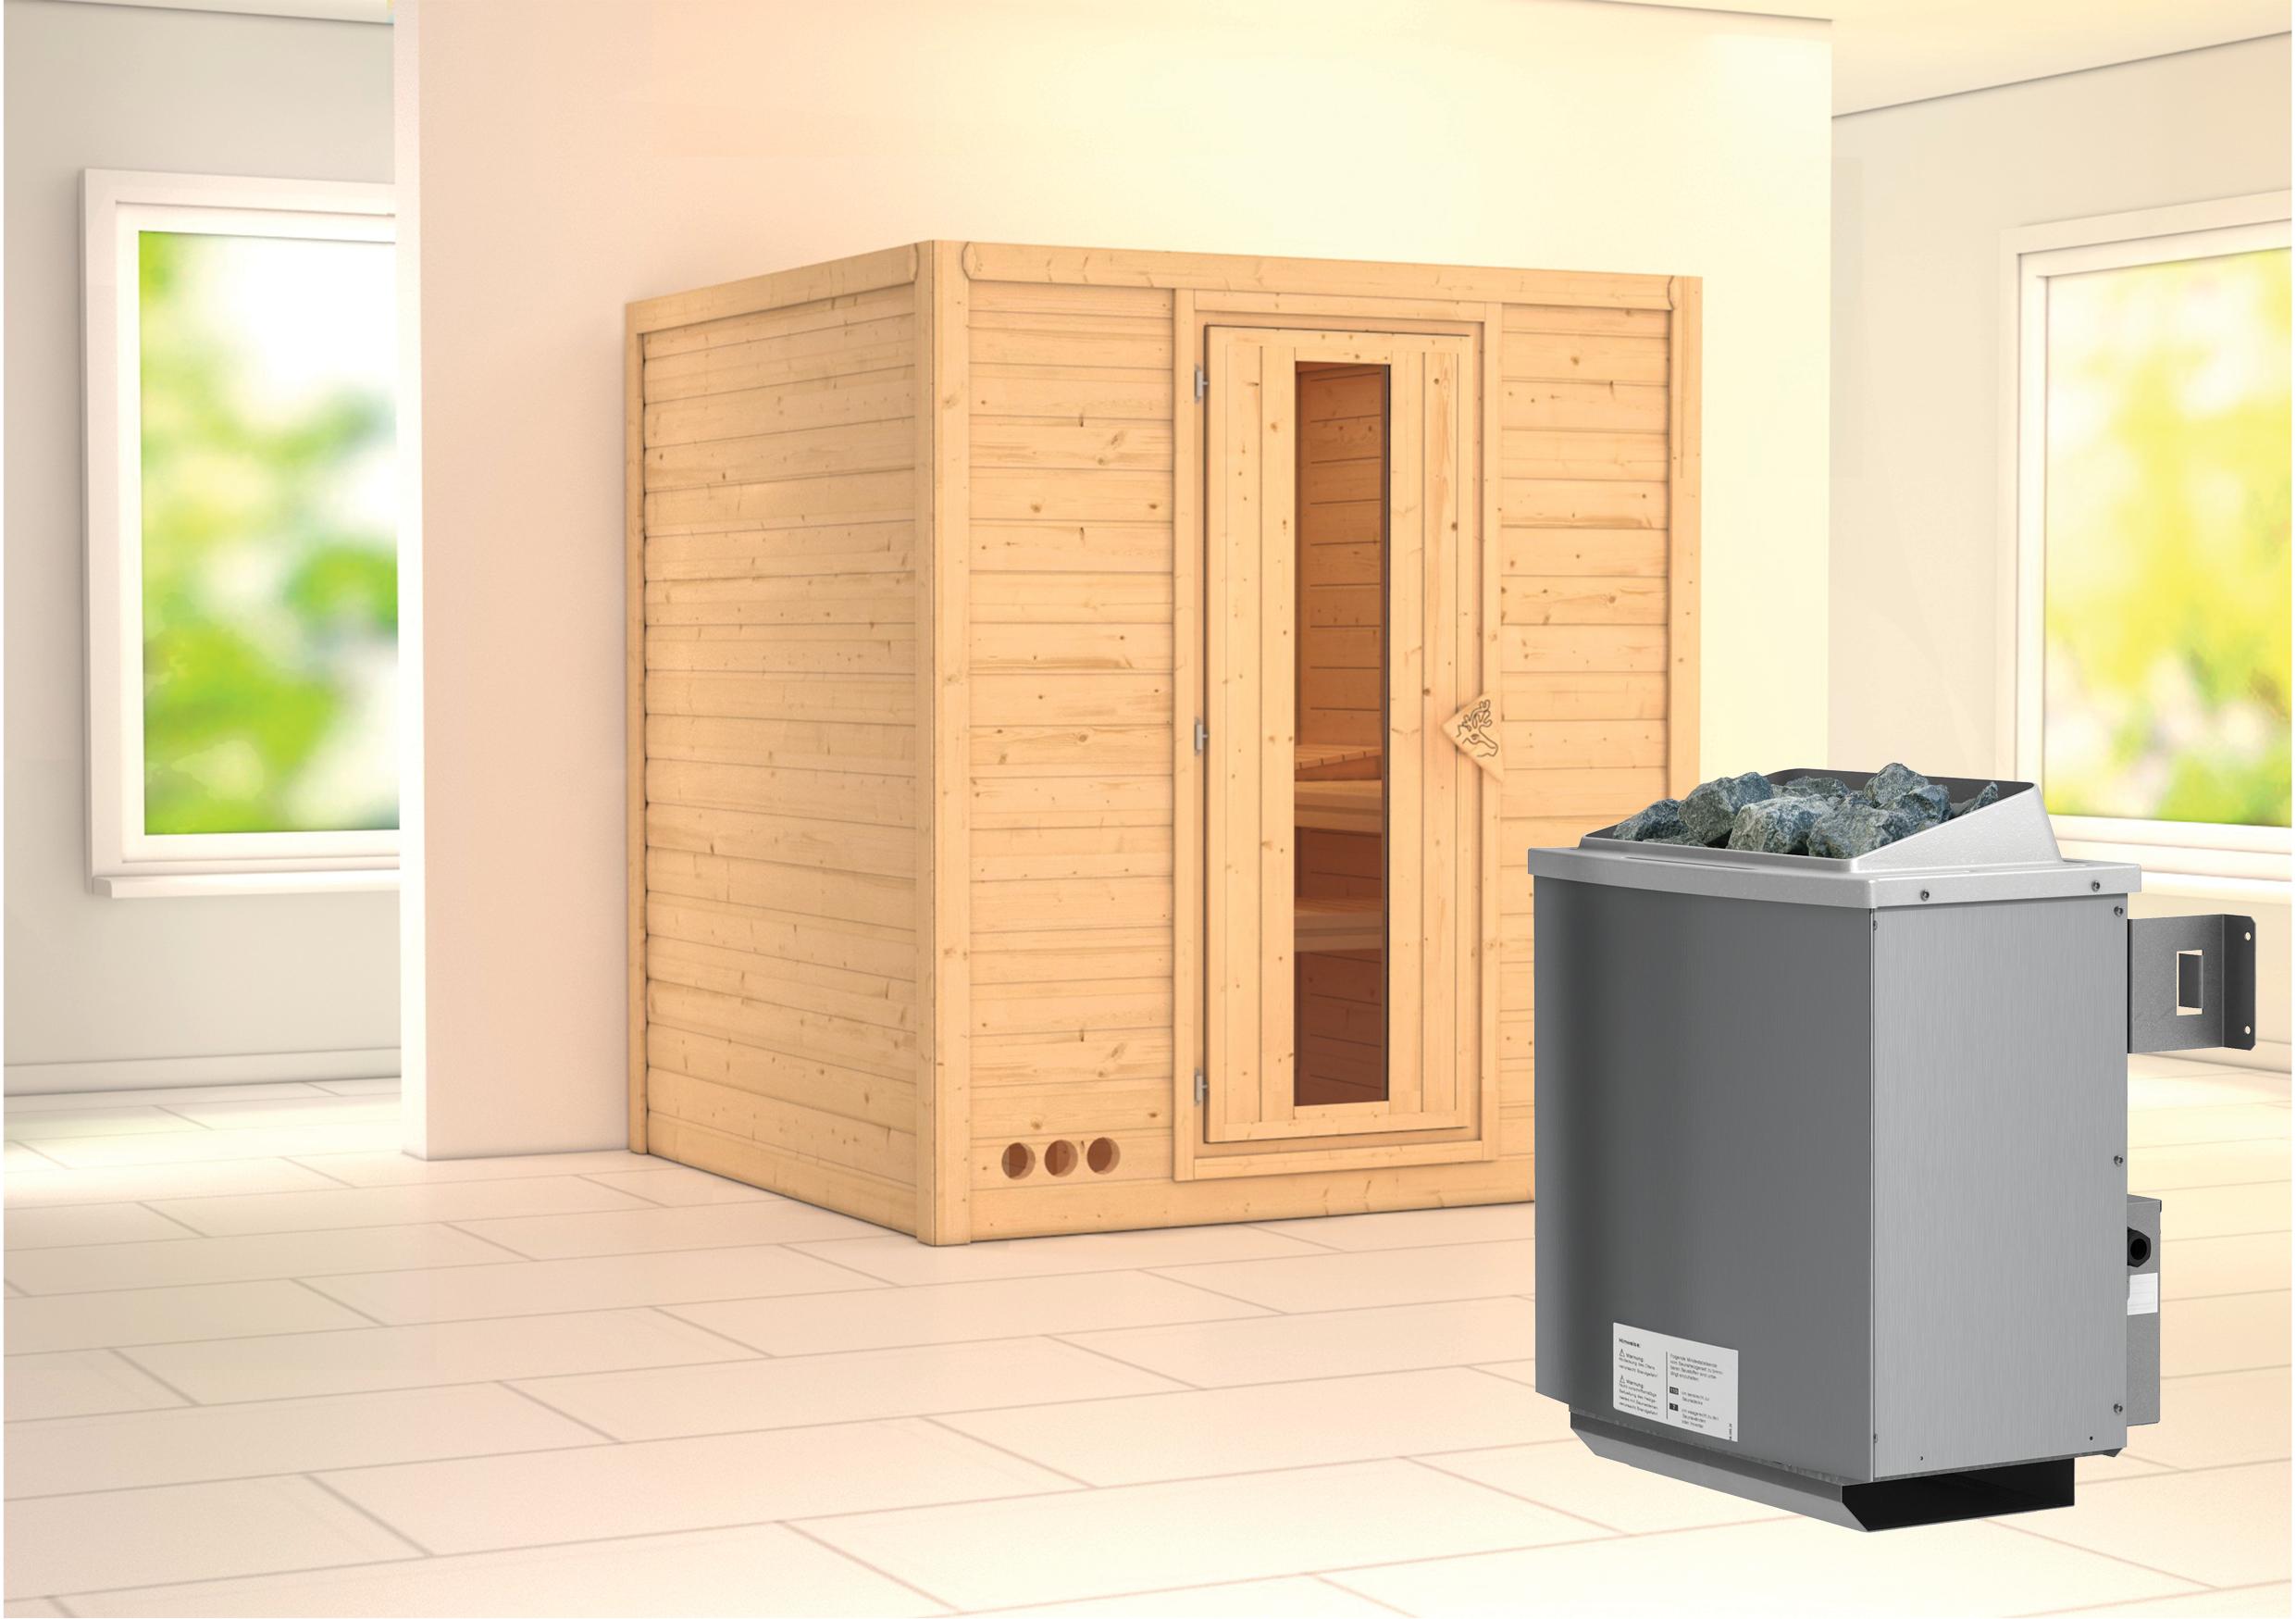 karibu massivholzsauna mojave 1 93 x 1 84 m 40 mm mit 9 kw ofen sauna heimsauna ebay. Black Bedroom Furniture Sets. Home Design Ideas